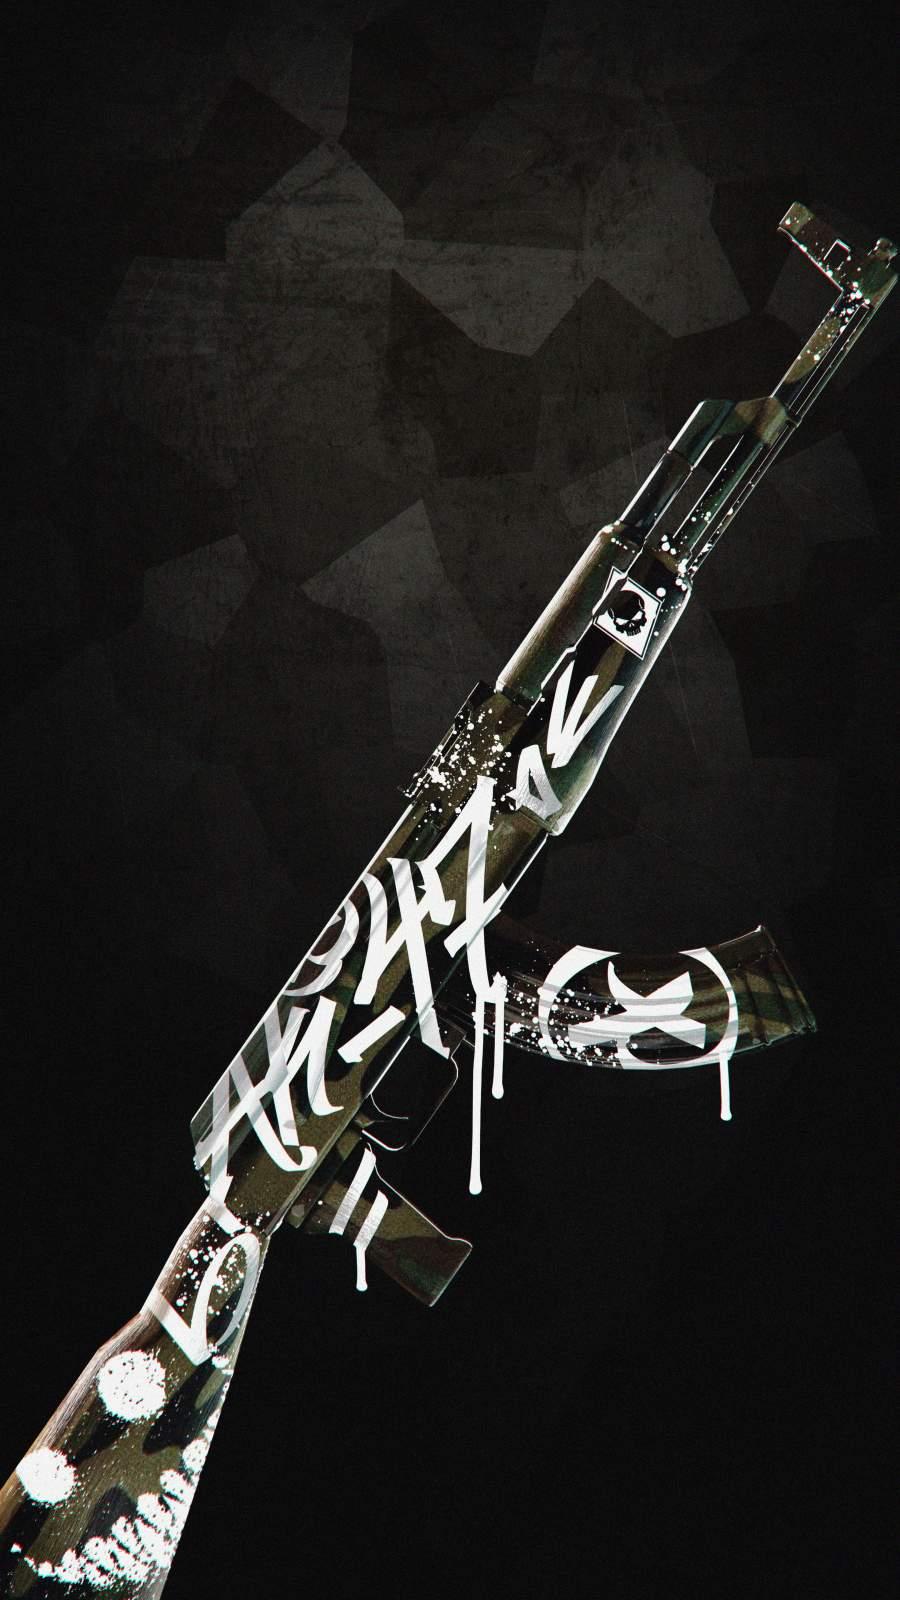 AK 47 Skin iPhone Wallpaper